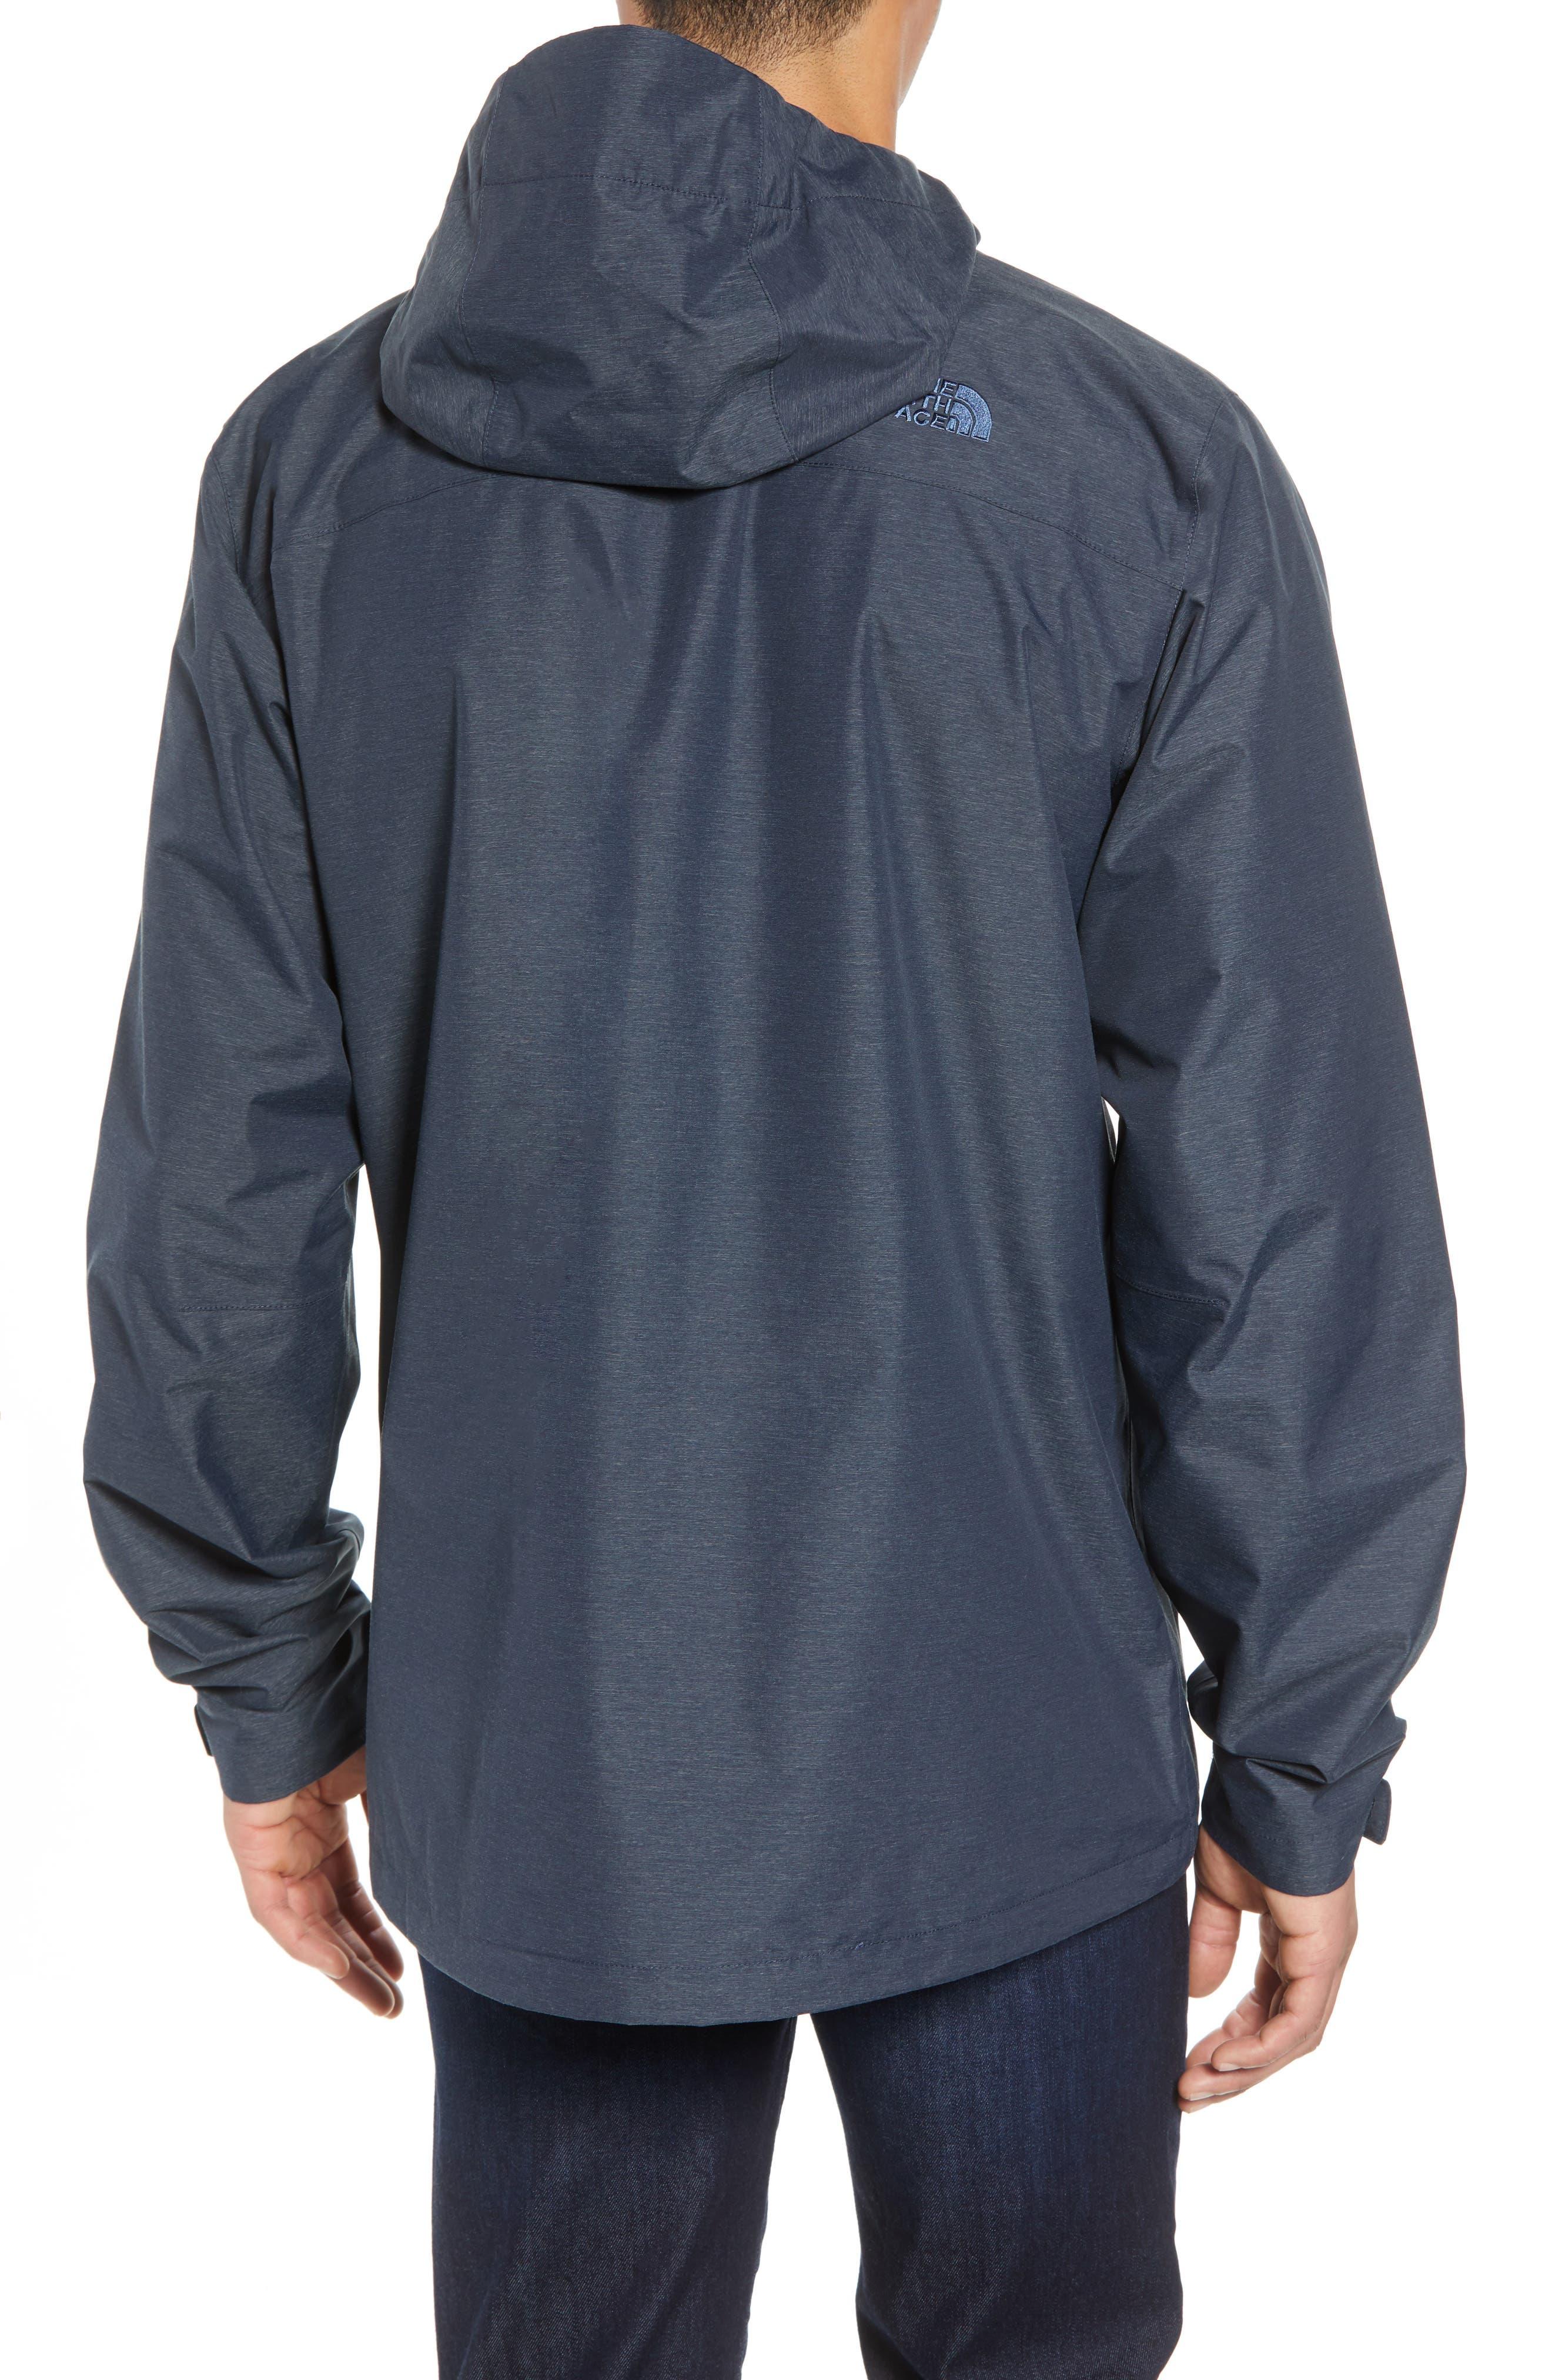 Venture 2 Waterproof Jacket,                             Alternate thumbnail 2, color,                             URBAN NAVY HEATHER